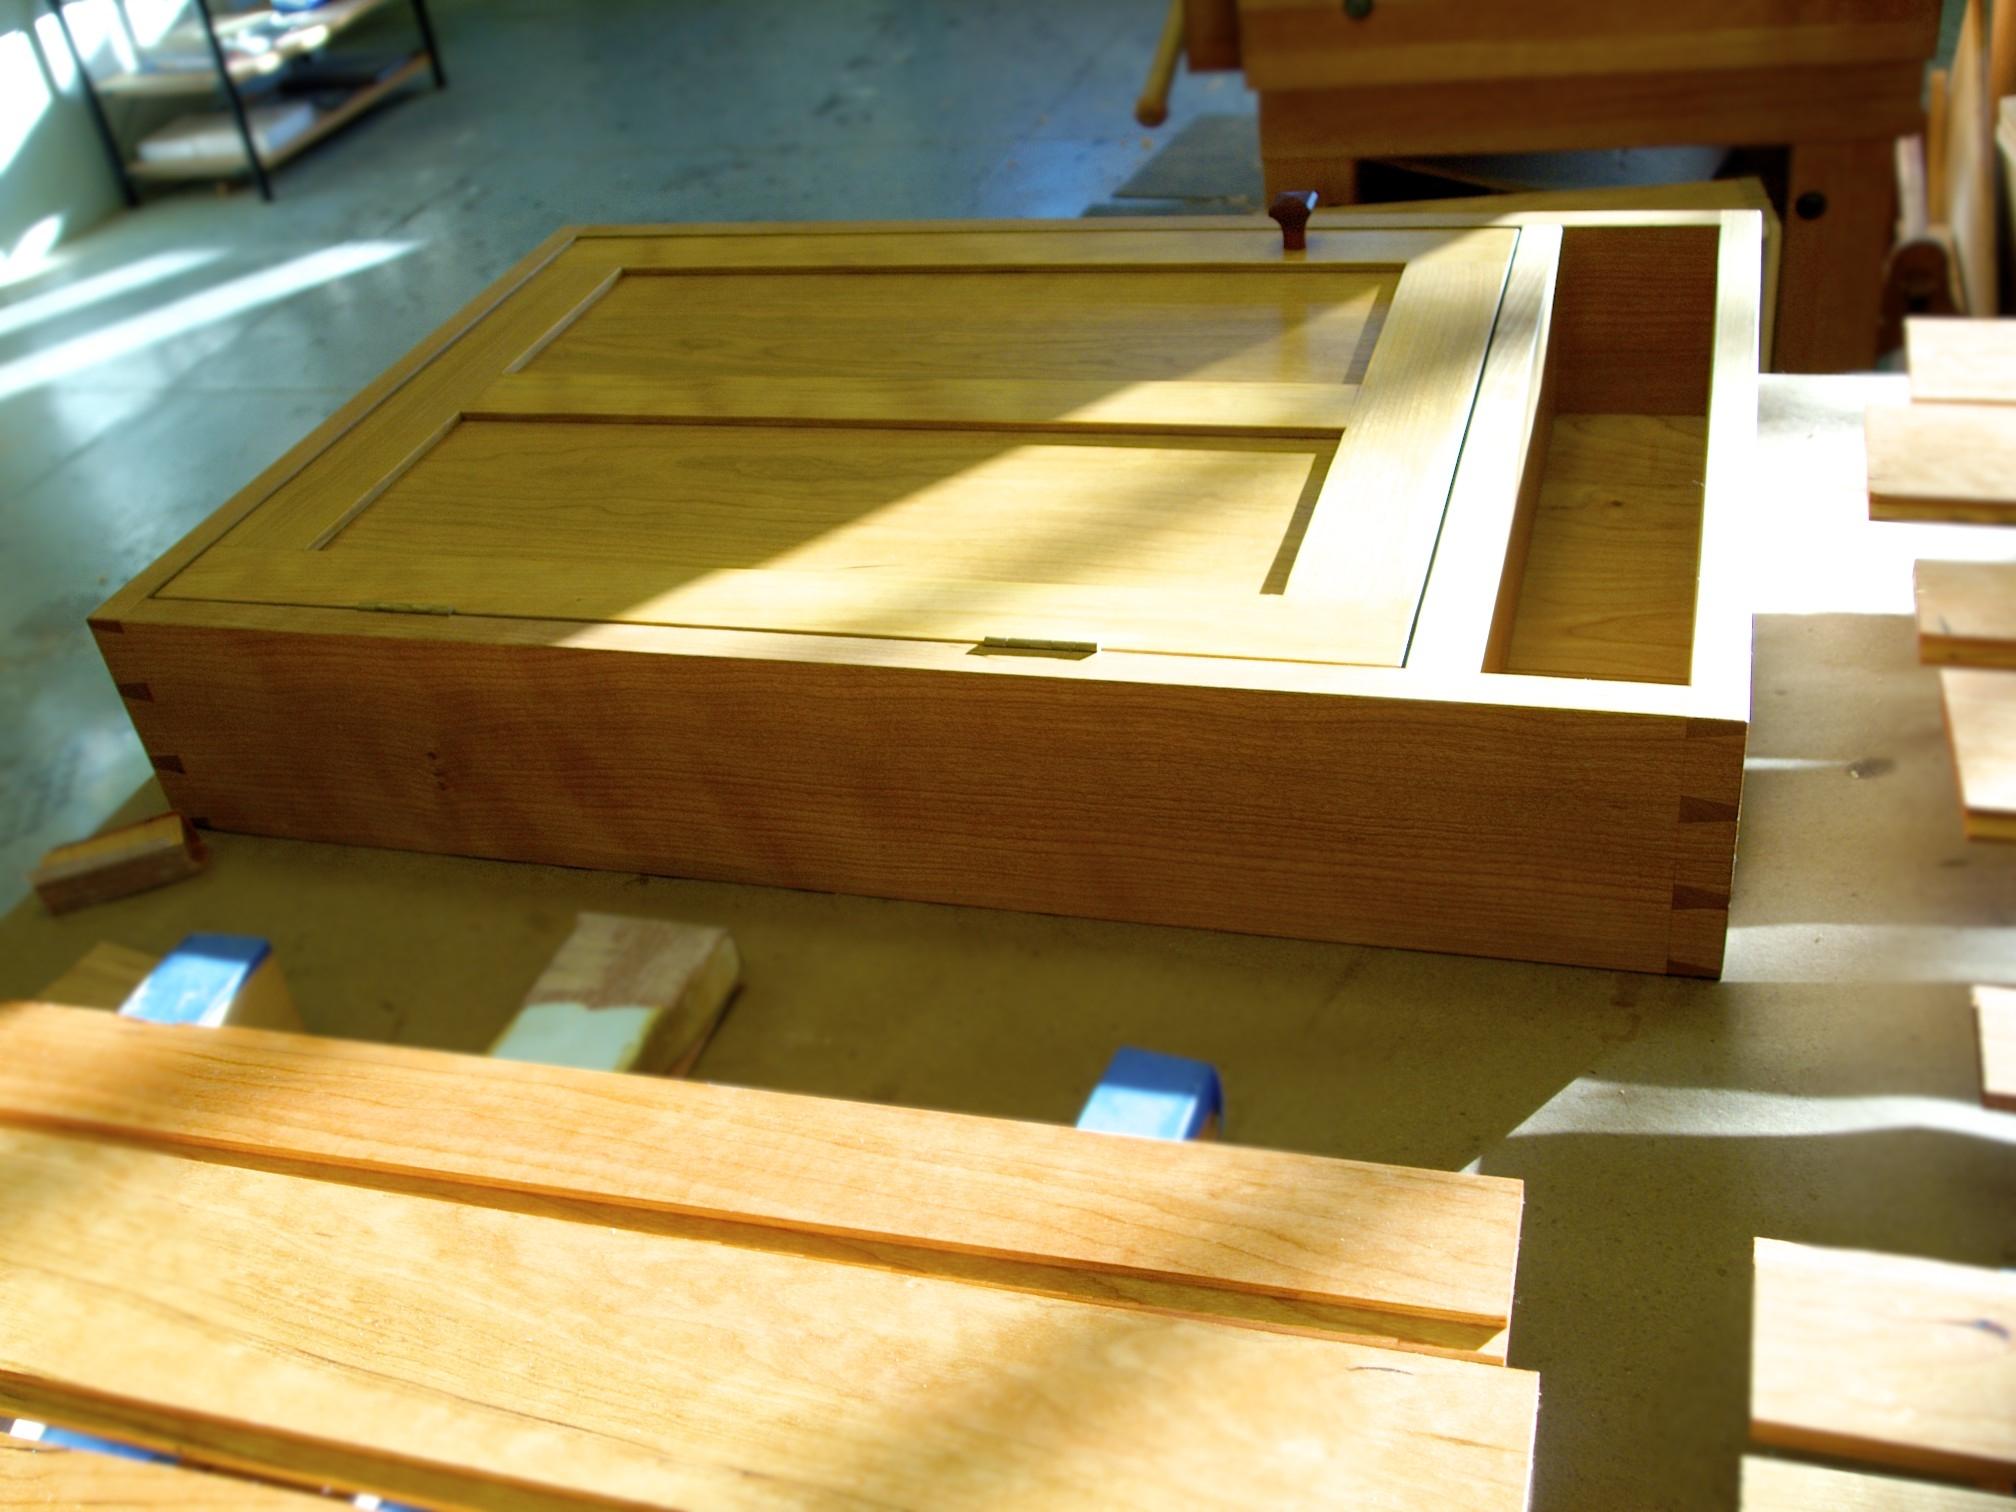 chisel cabinets 21.jpg